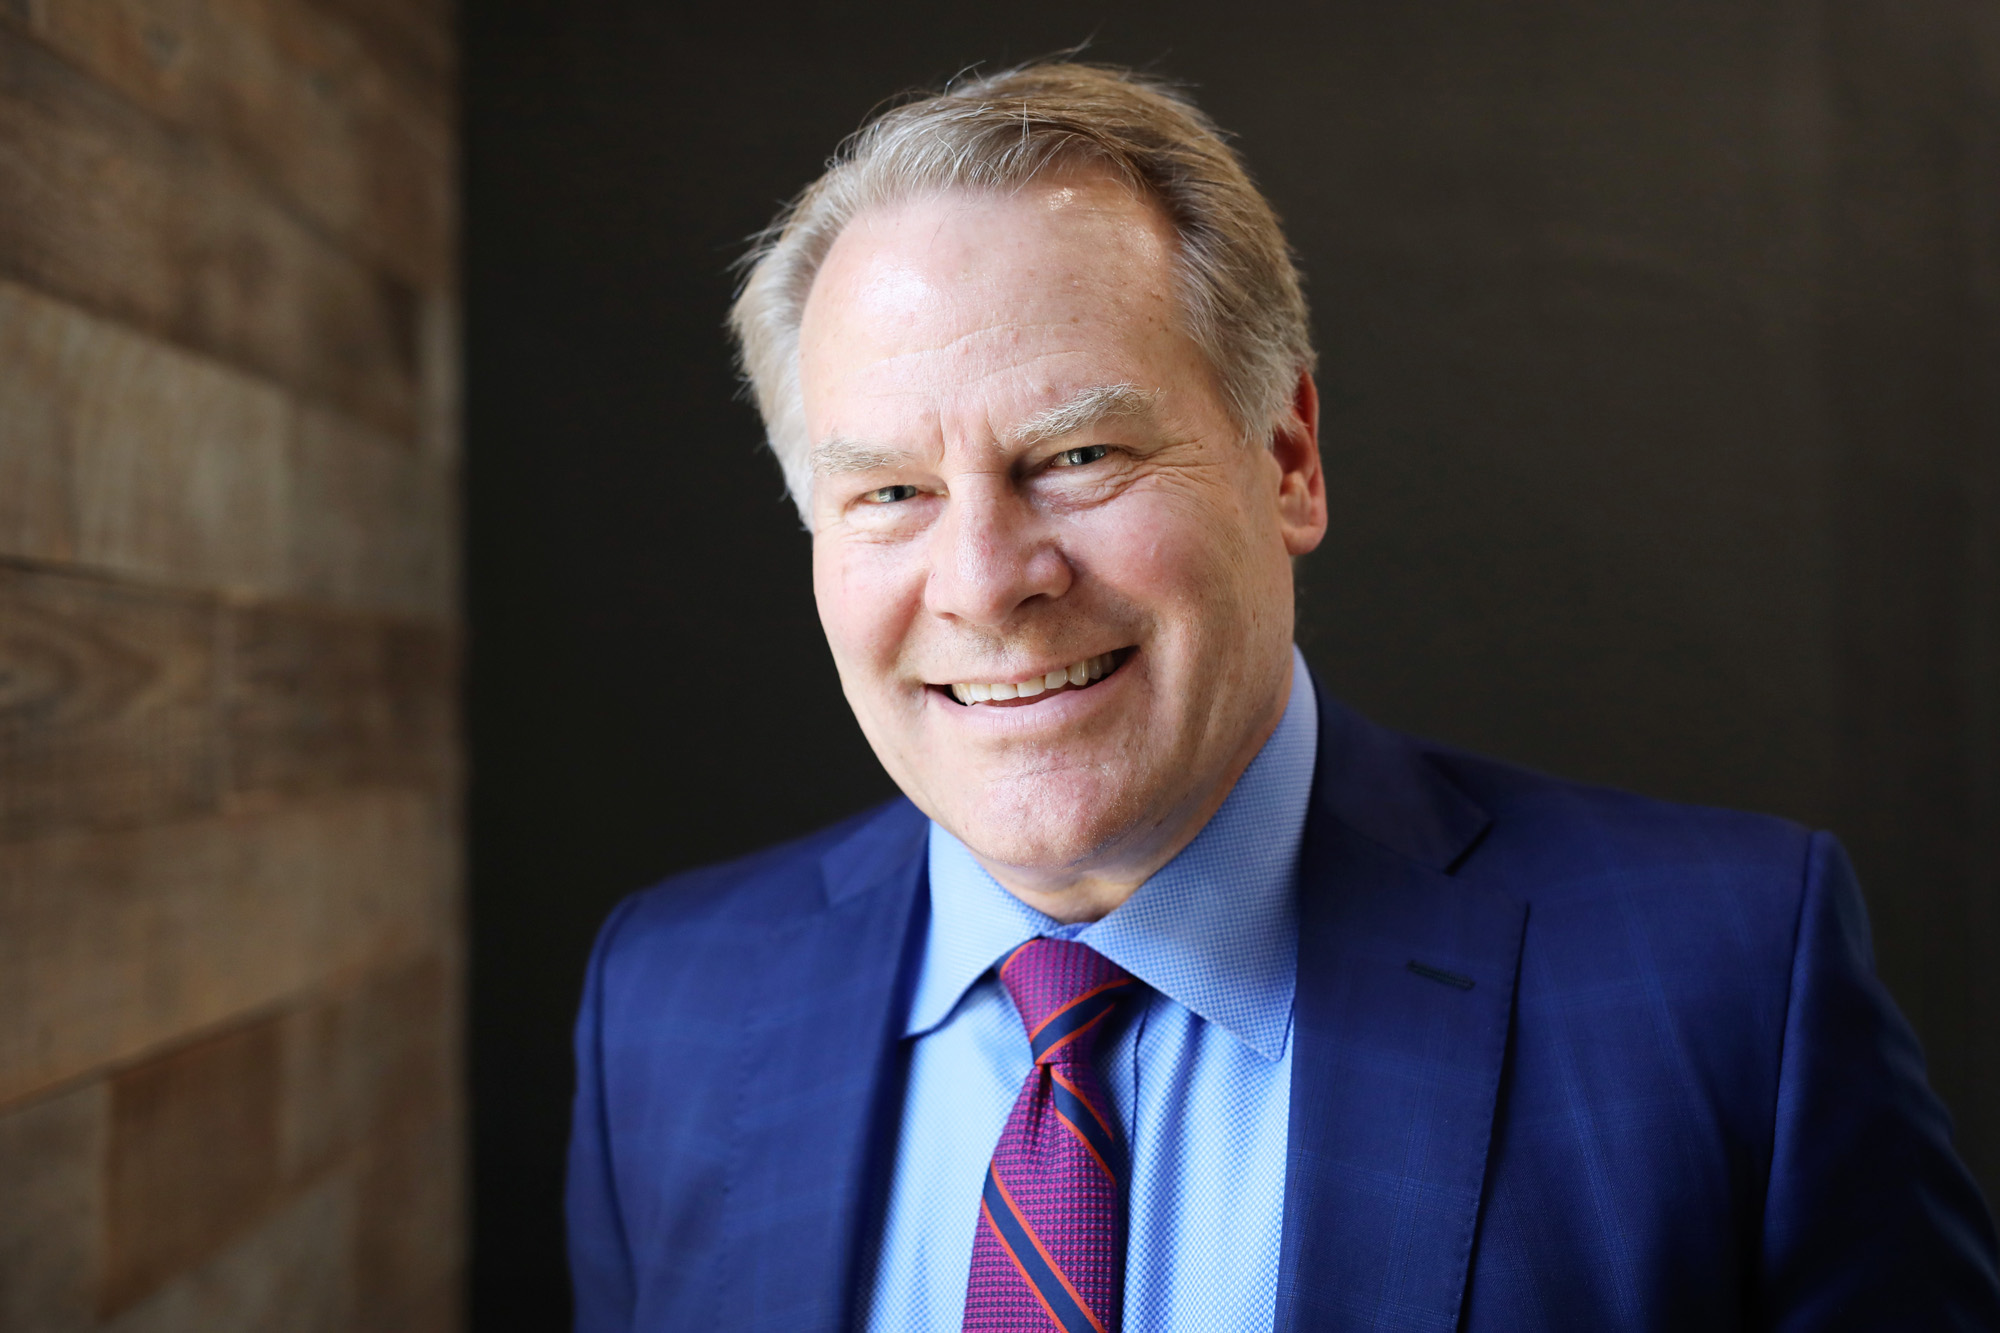 Jeffrey R. Loehnis